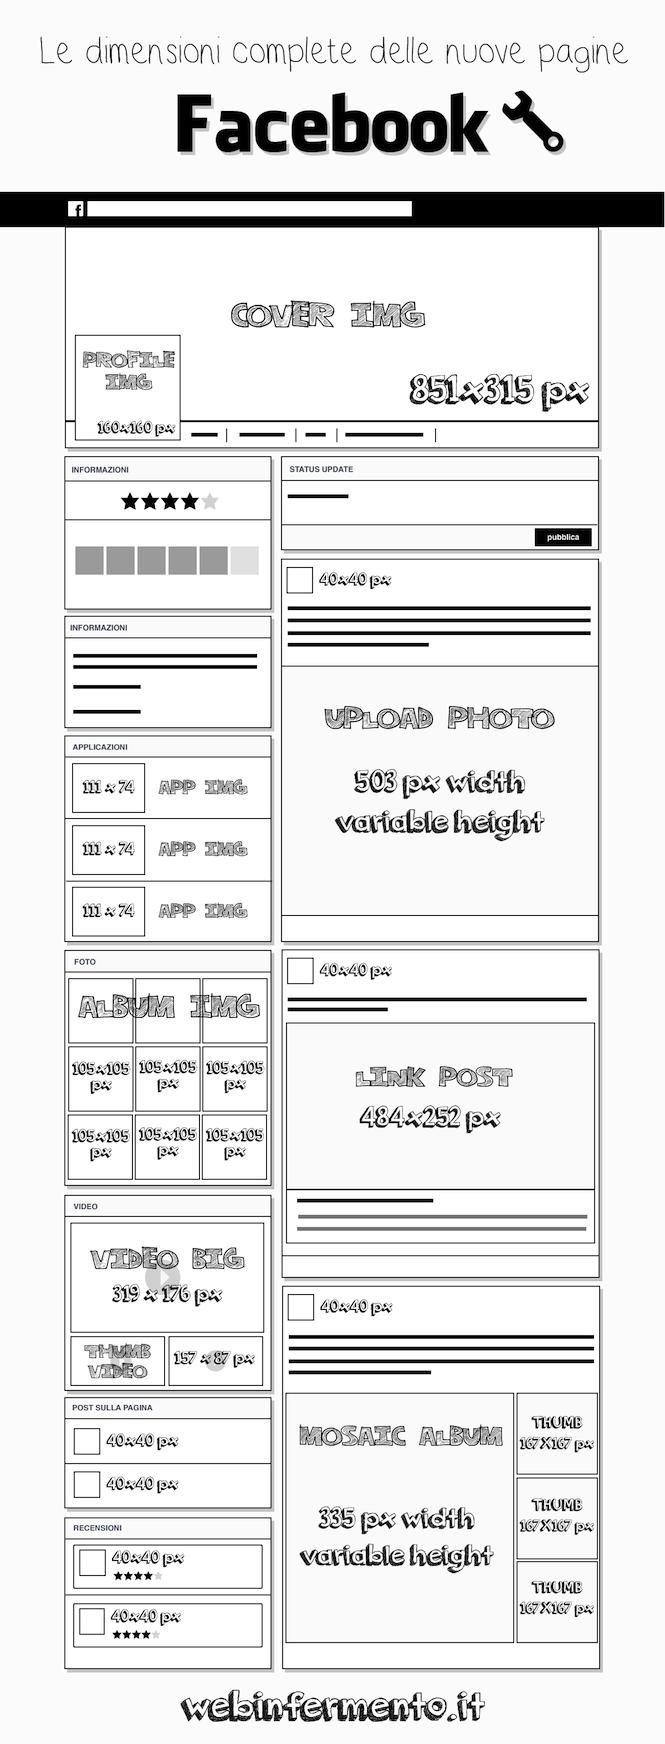 facbook size infographic